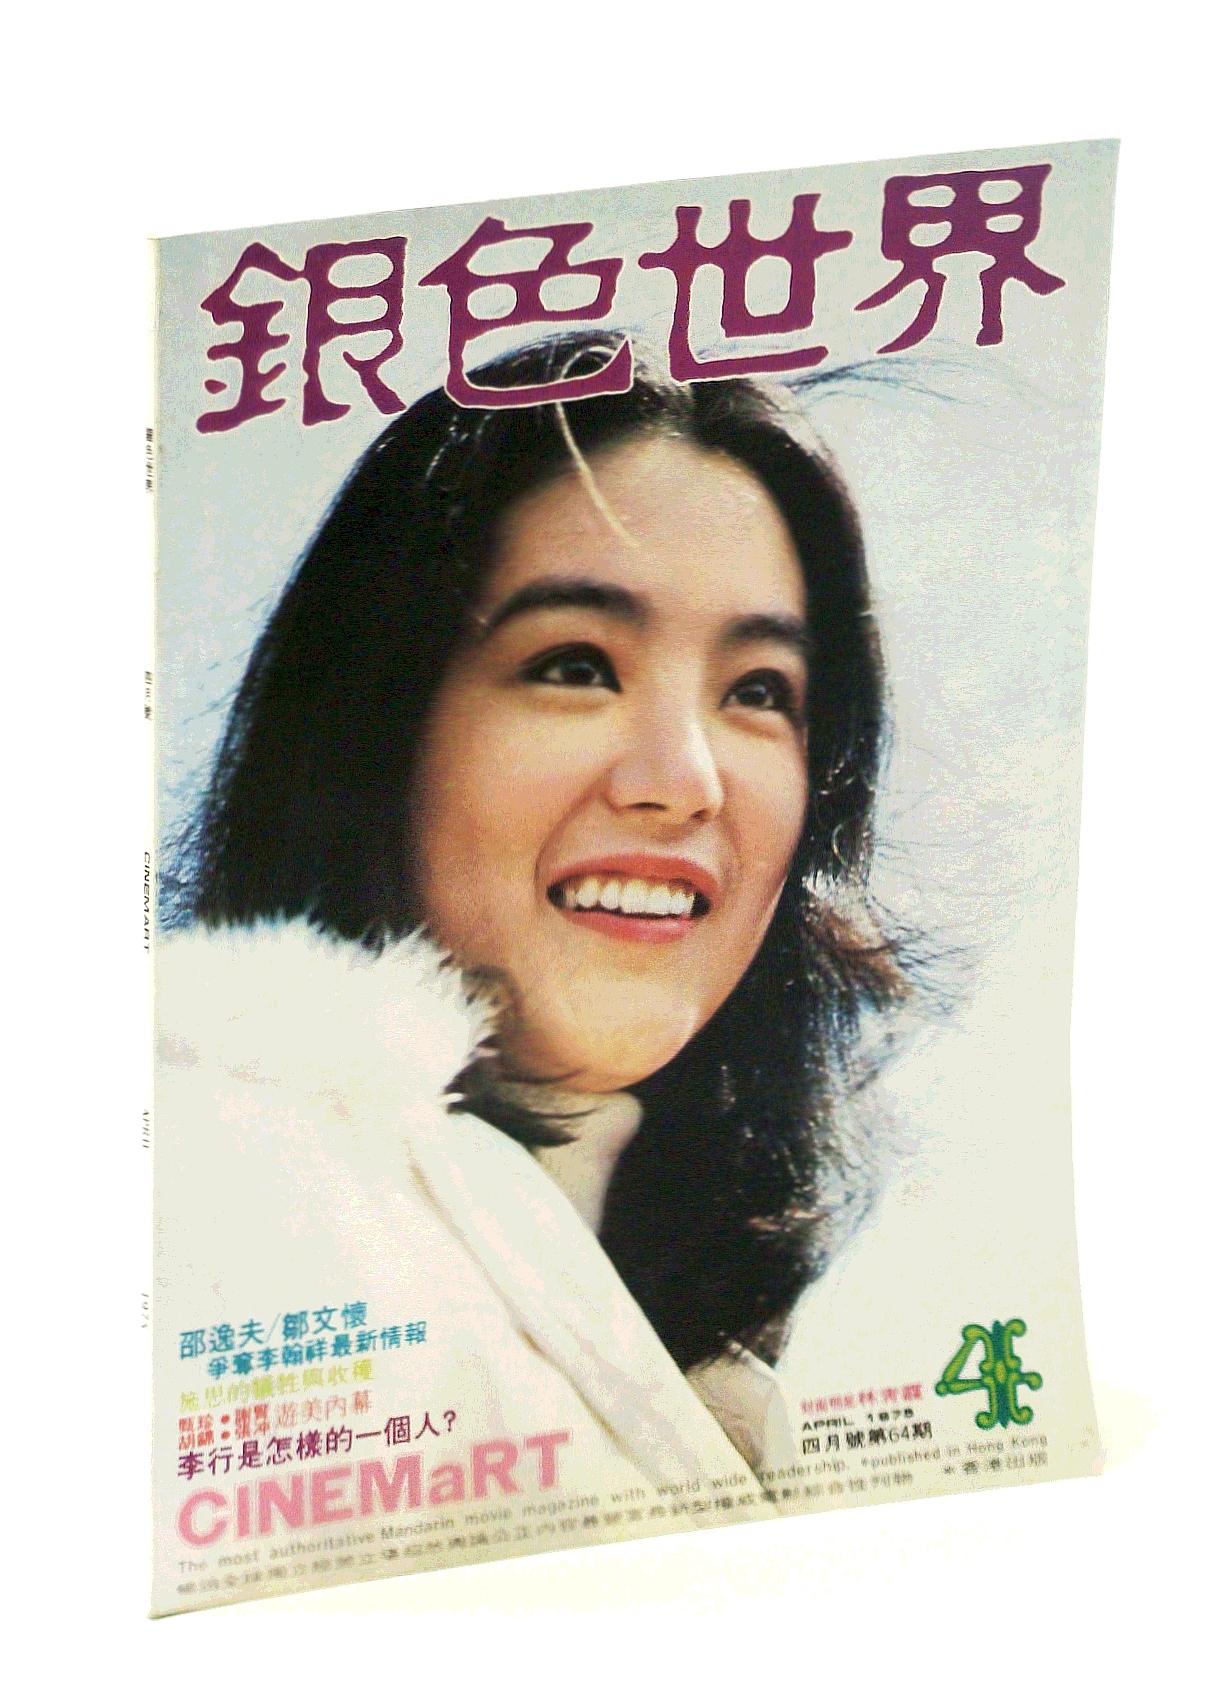 Image for Cinemart - The Most Authoritative Mandarin Movie Magazine, April [Apr.] 1975, No. 64